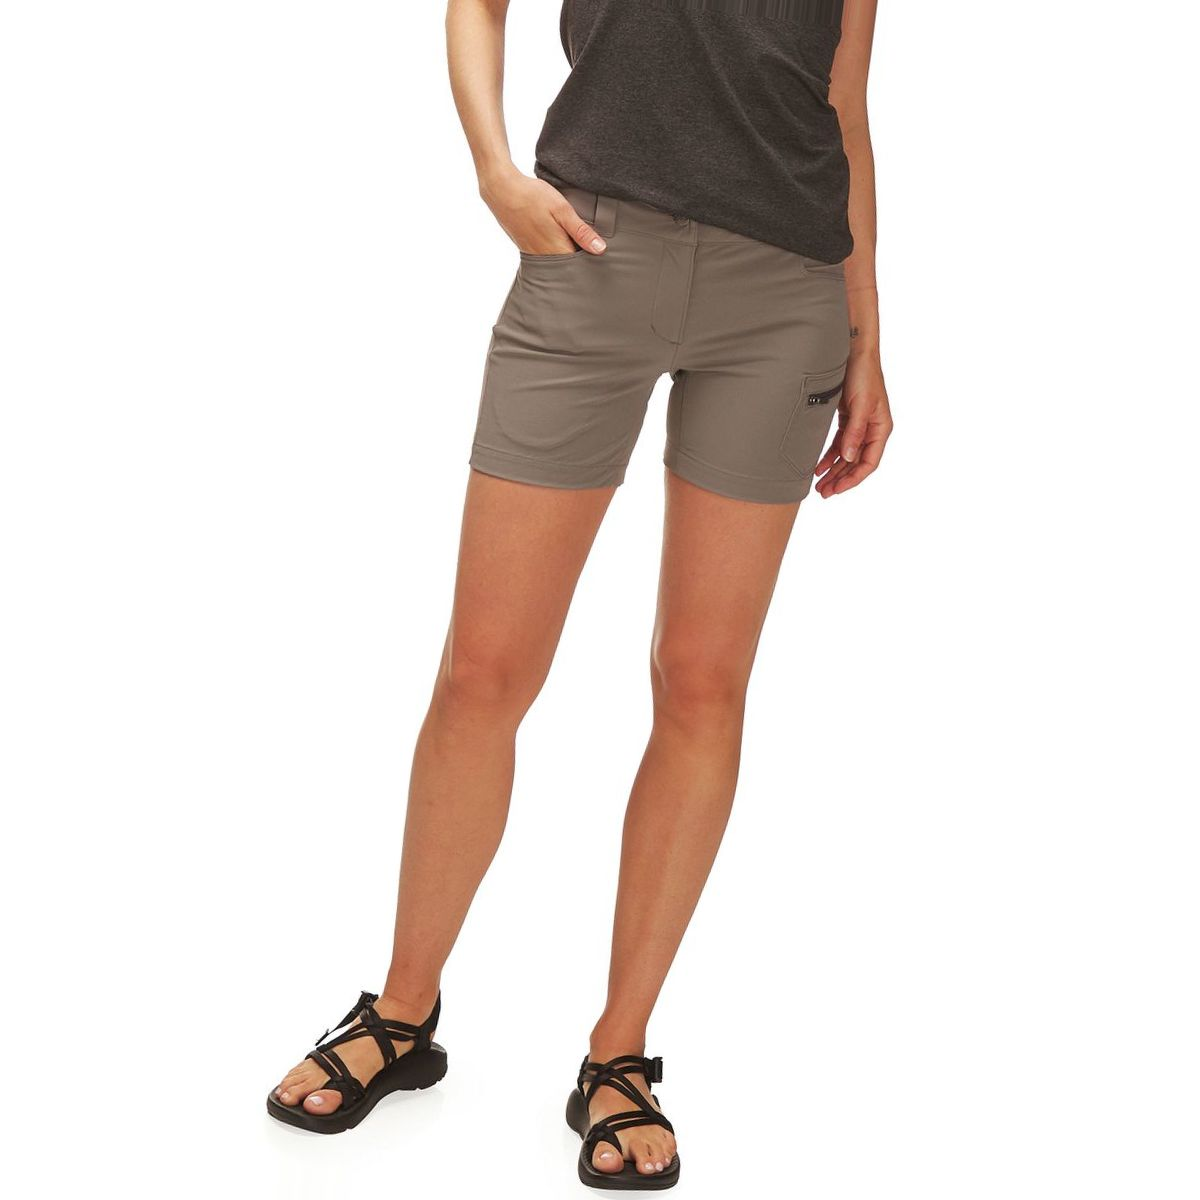 Outdoor Research Ferrosi Short - Women's